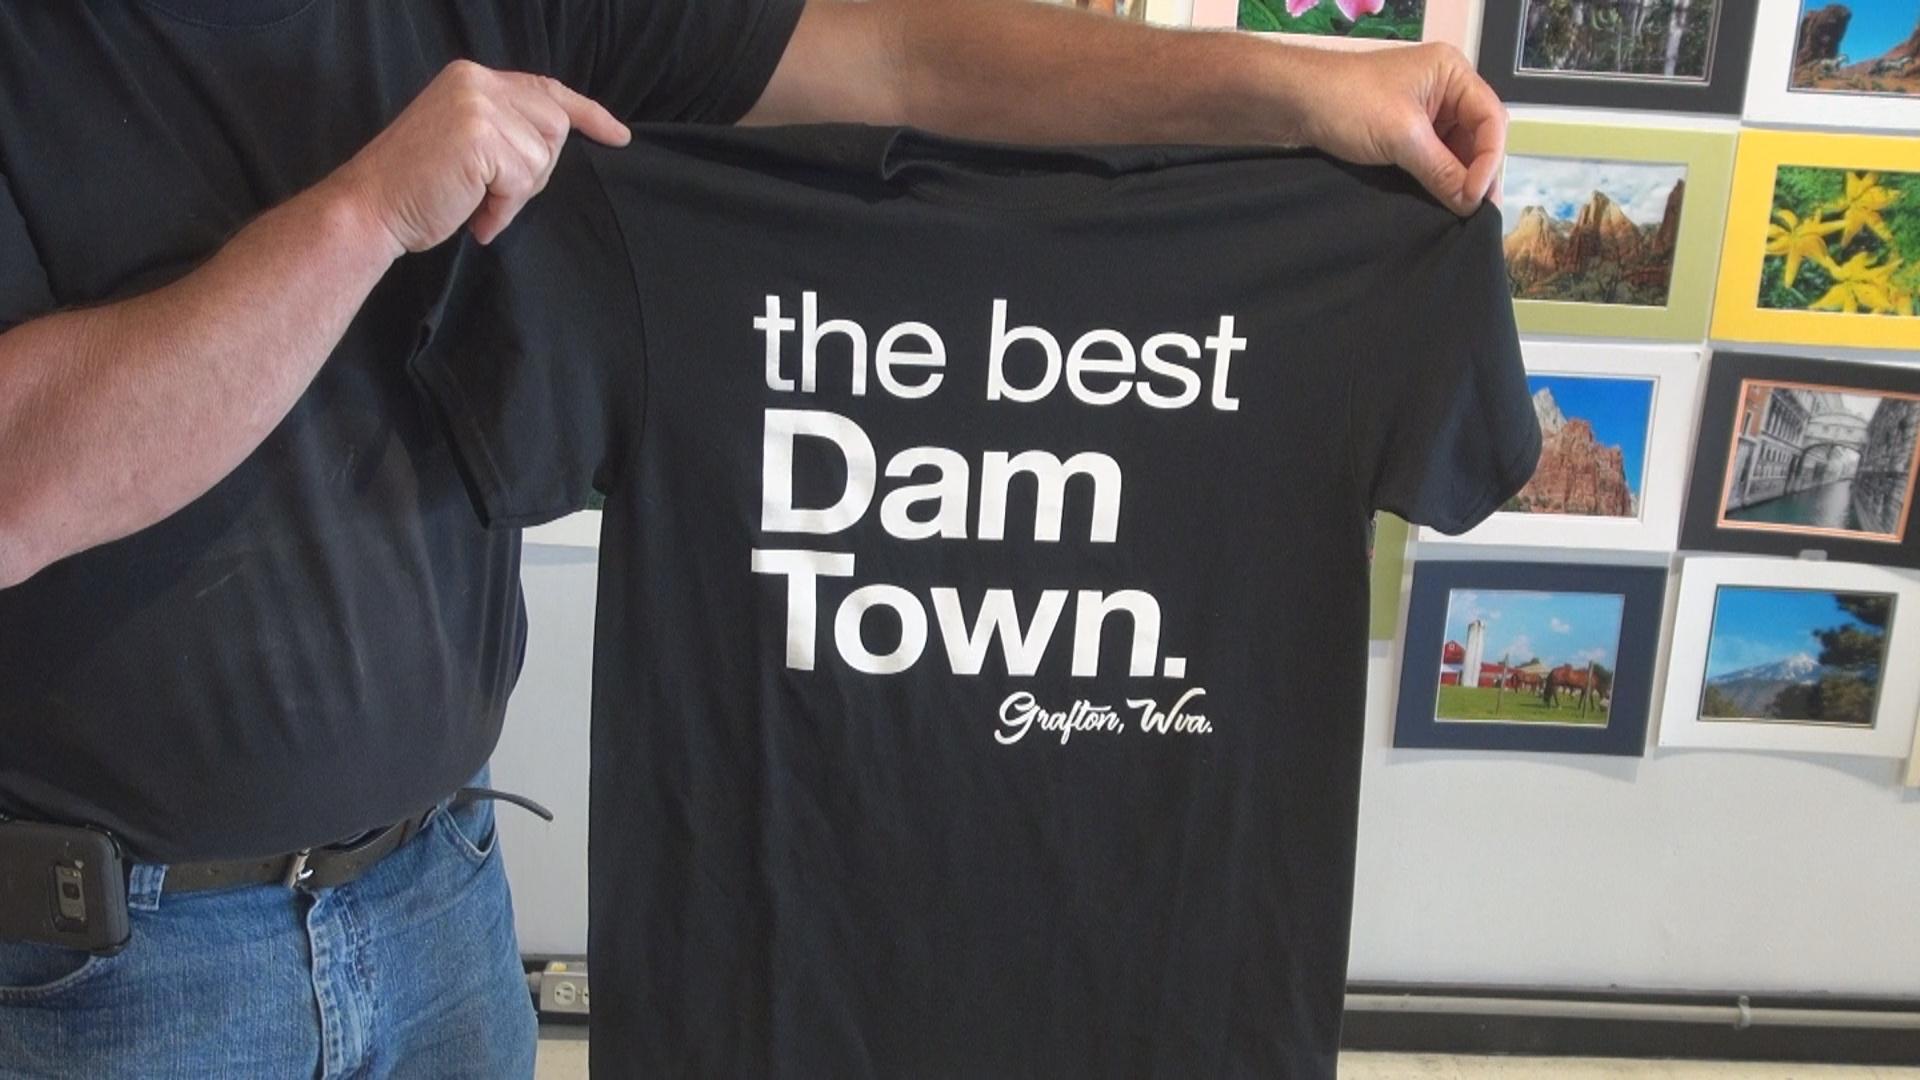 grafton best dam city_1531170860443.jpg